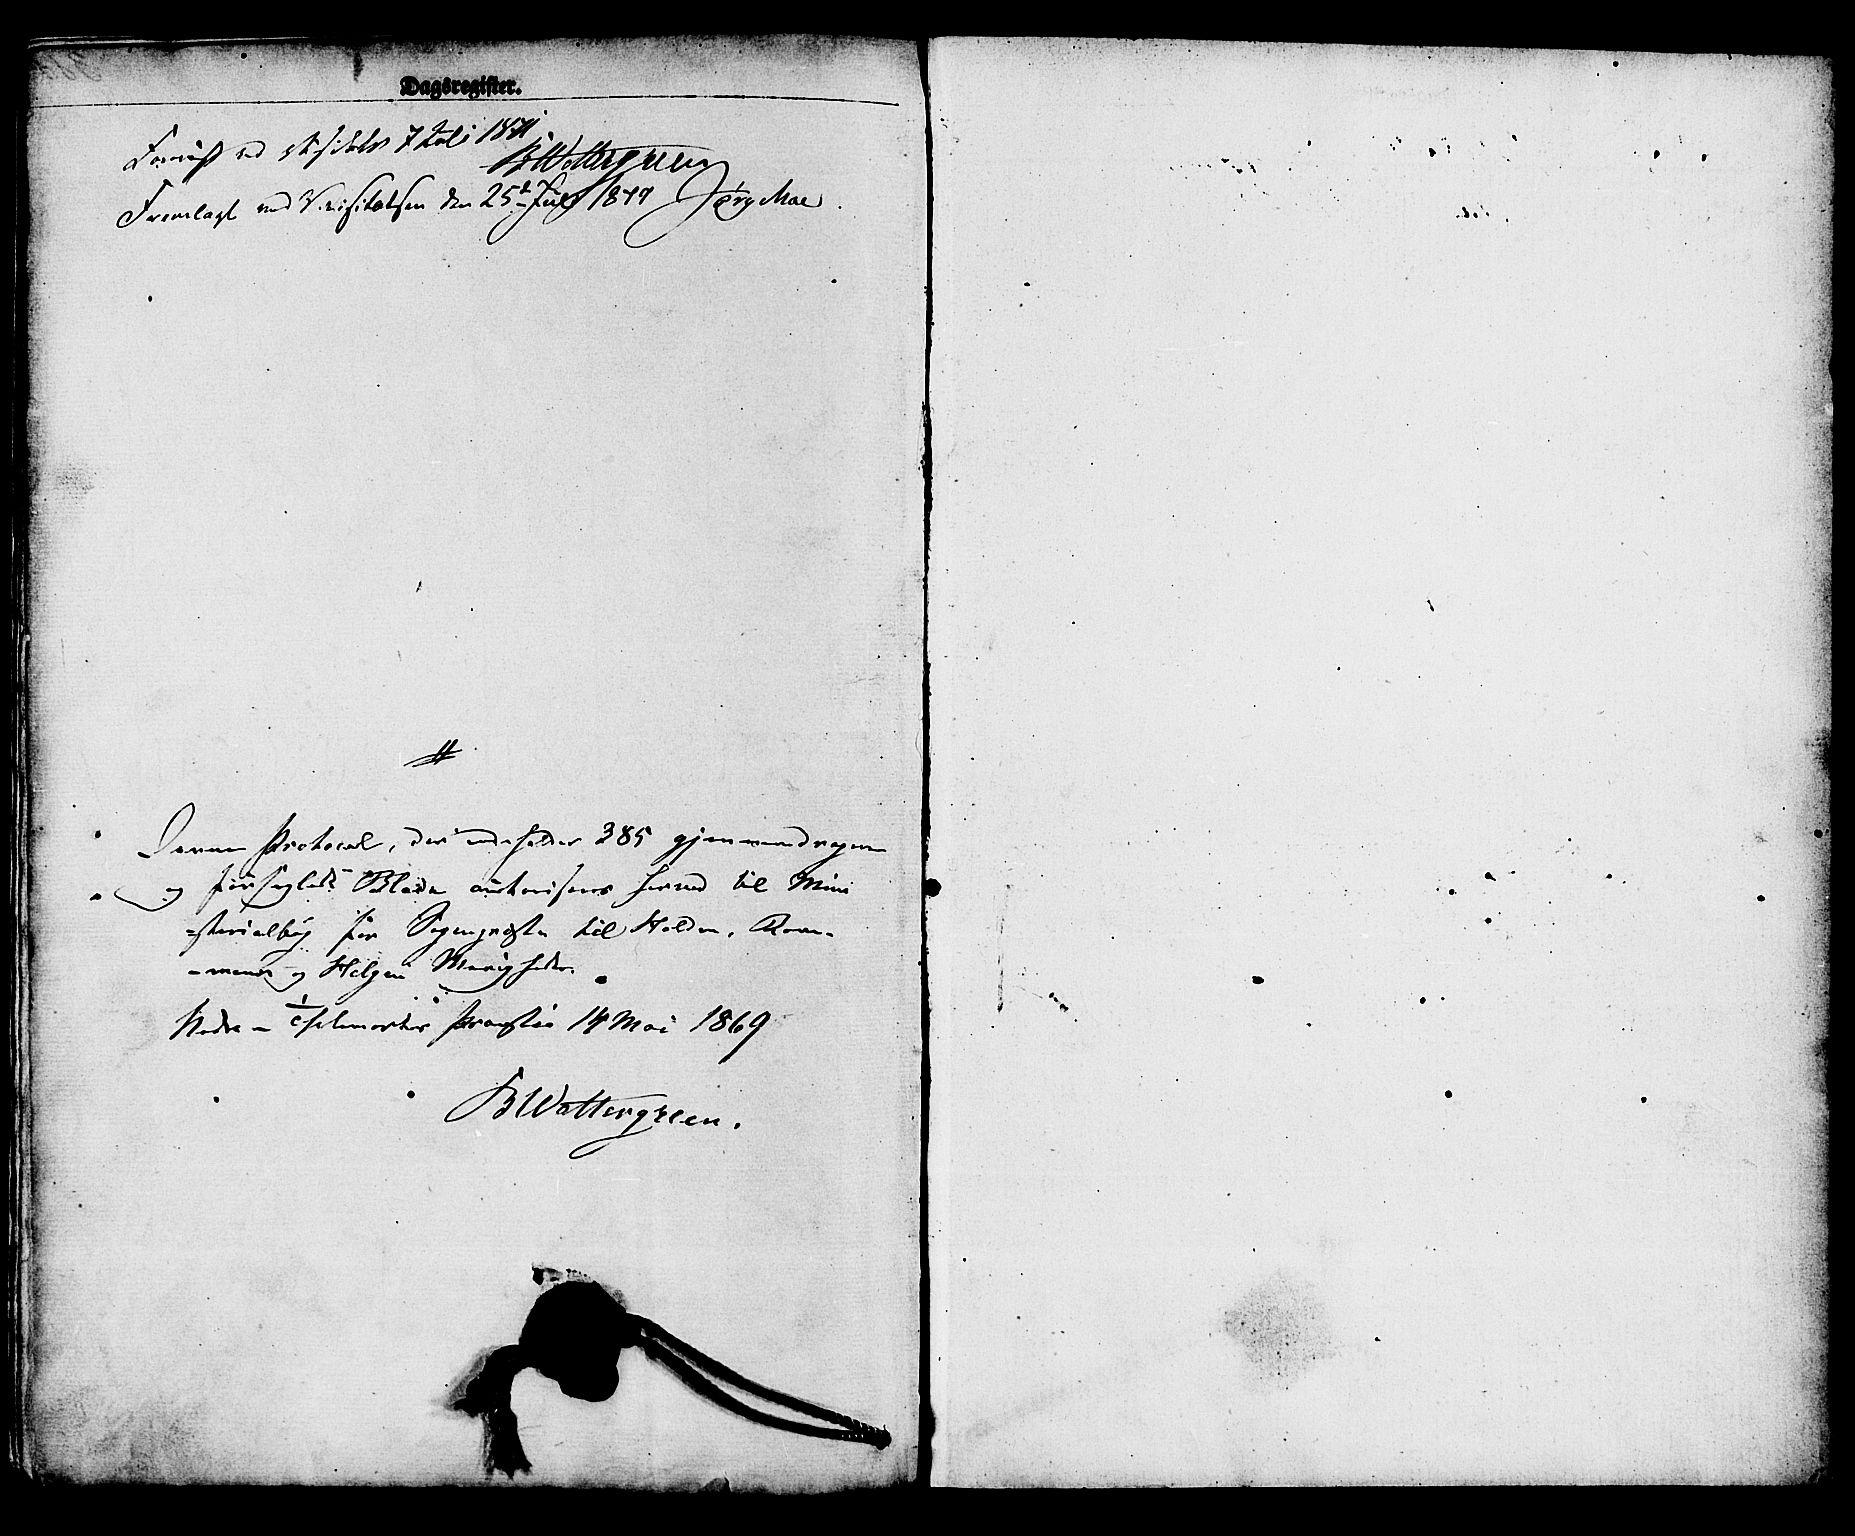 SAKO, Holla kirkebøker, F/Fa/L0007: Ministerialbok nr. 7, 1869-1881